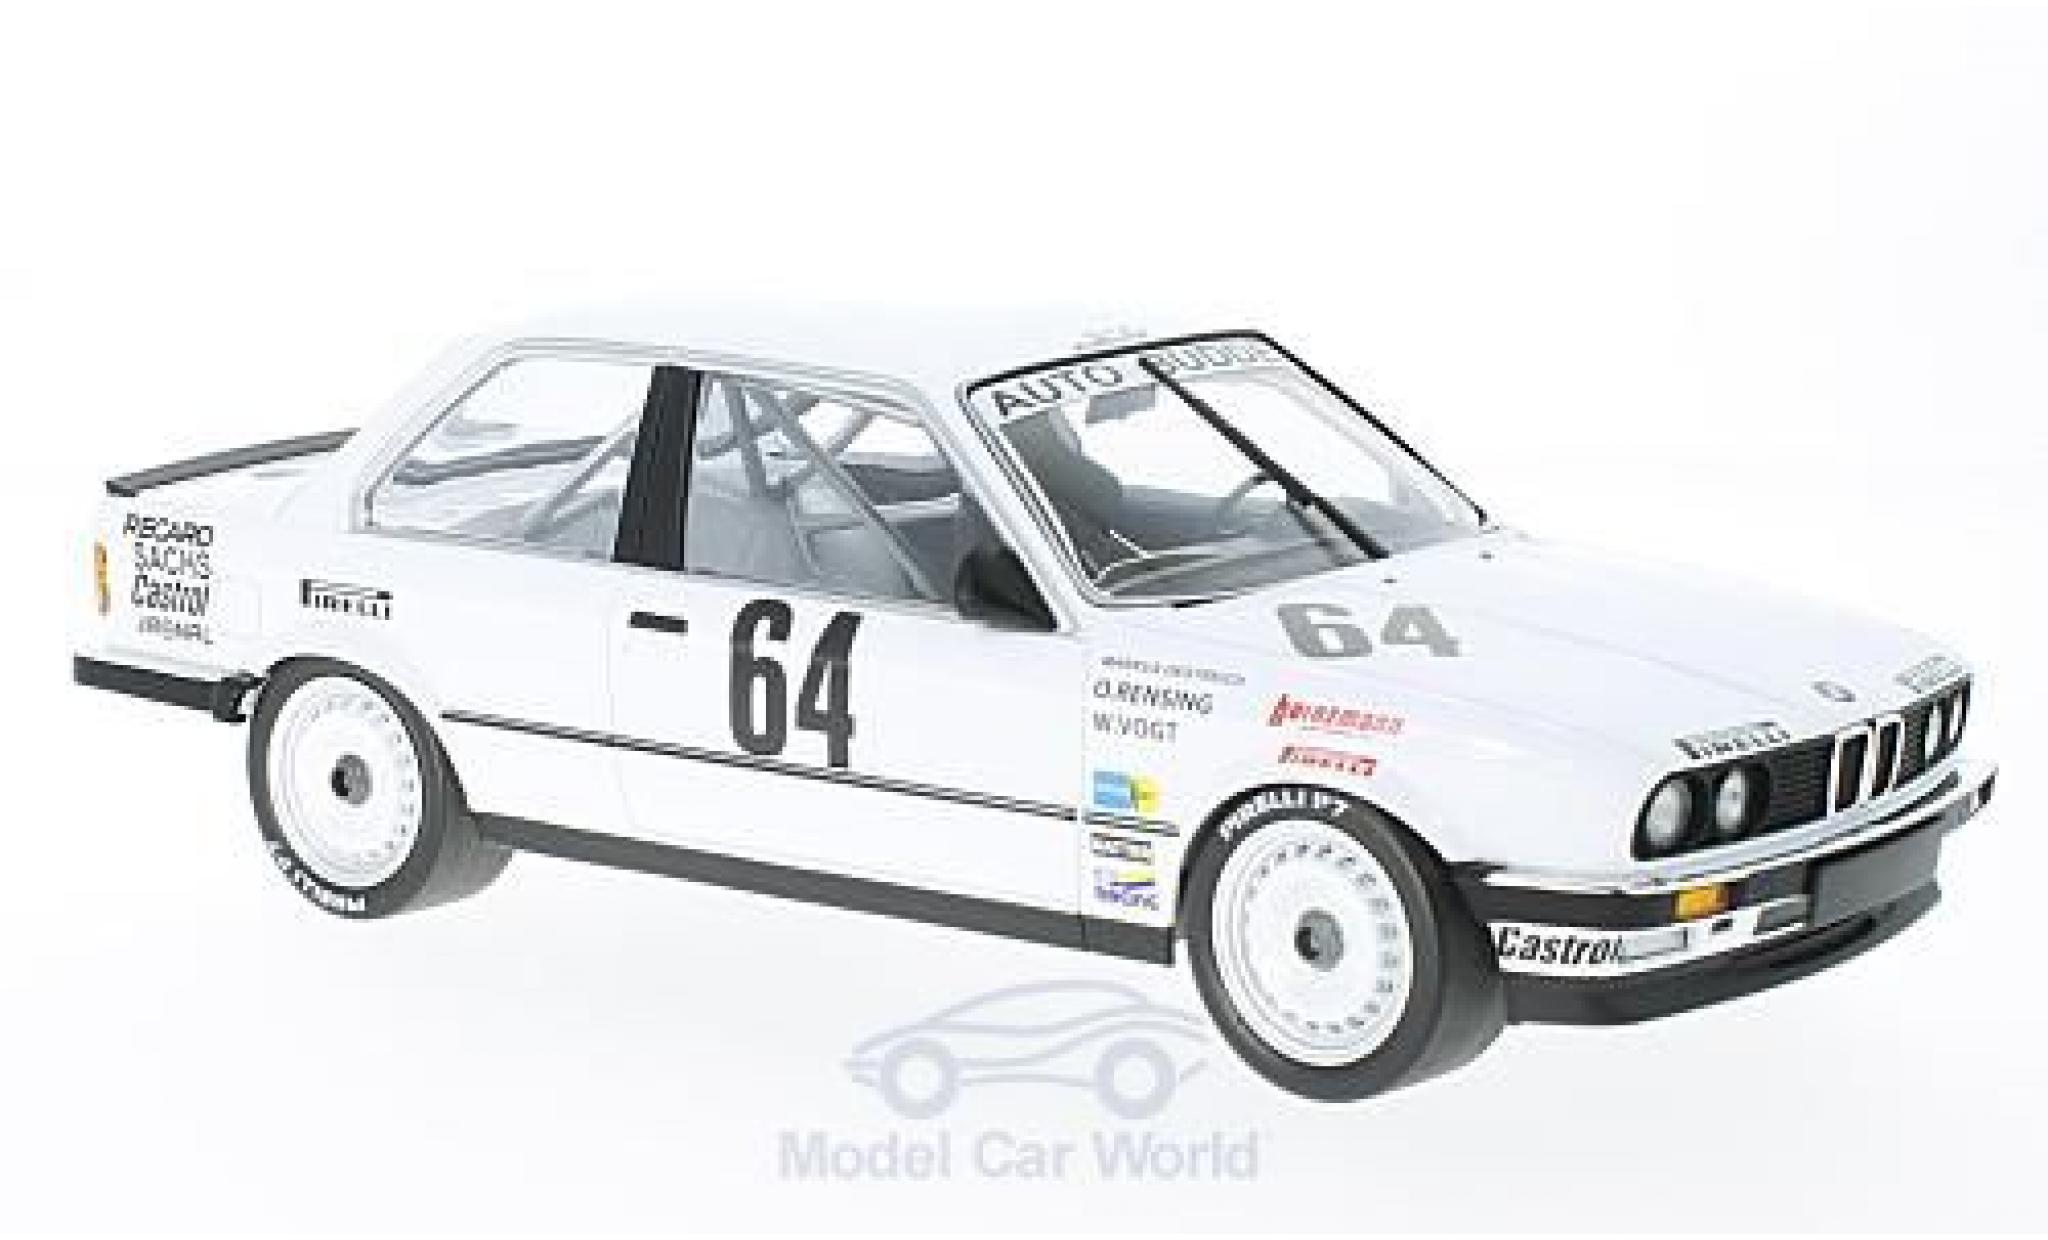 Bmw 325 1/18 Minichamps BMW i No.64 Auto Budde Team 24h Nürburgring 1986 M.Oestreich/O.Rensing/W.Vogt